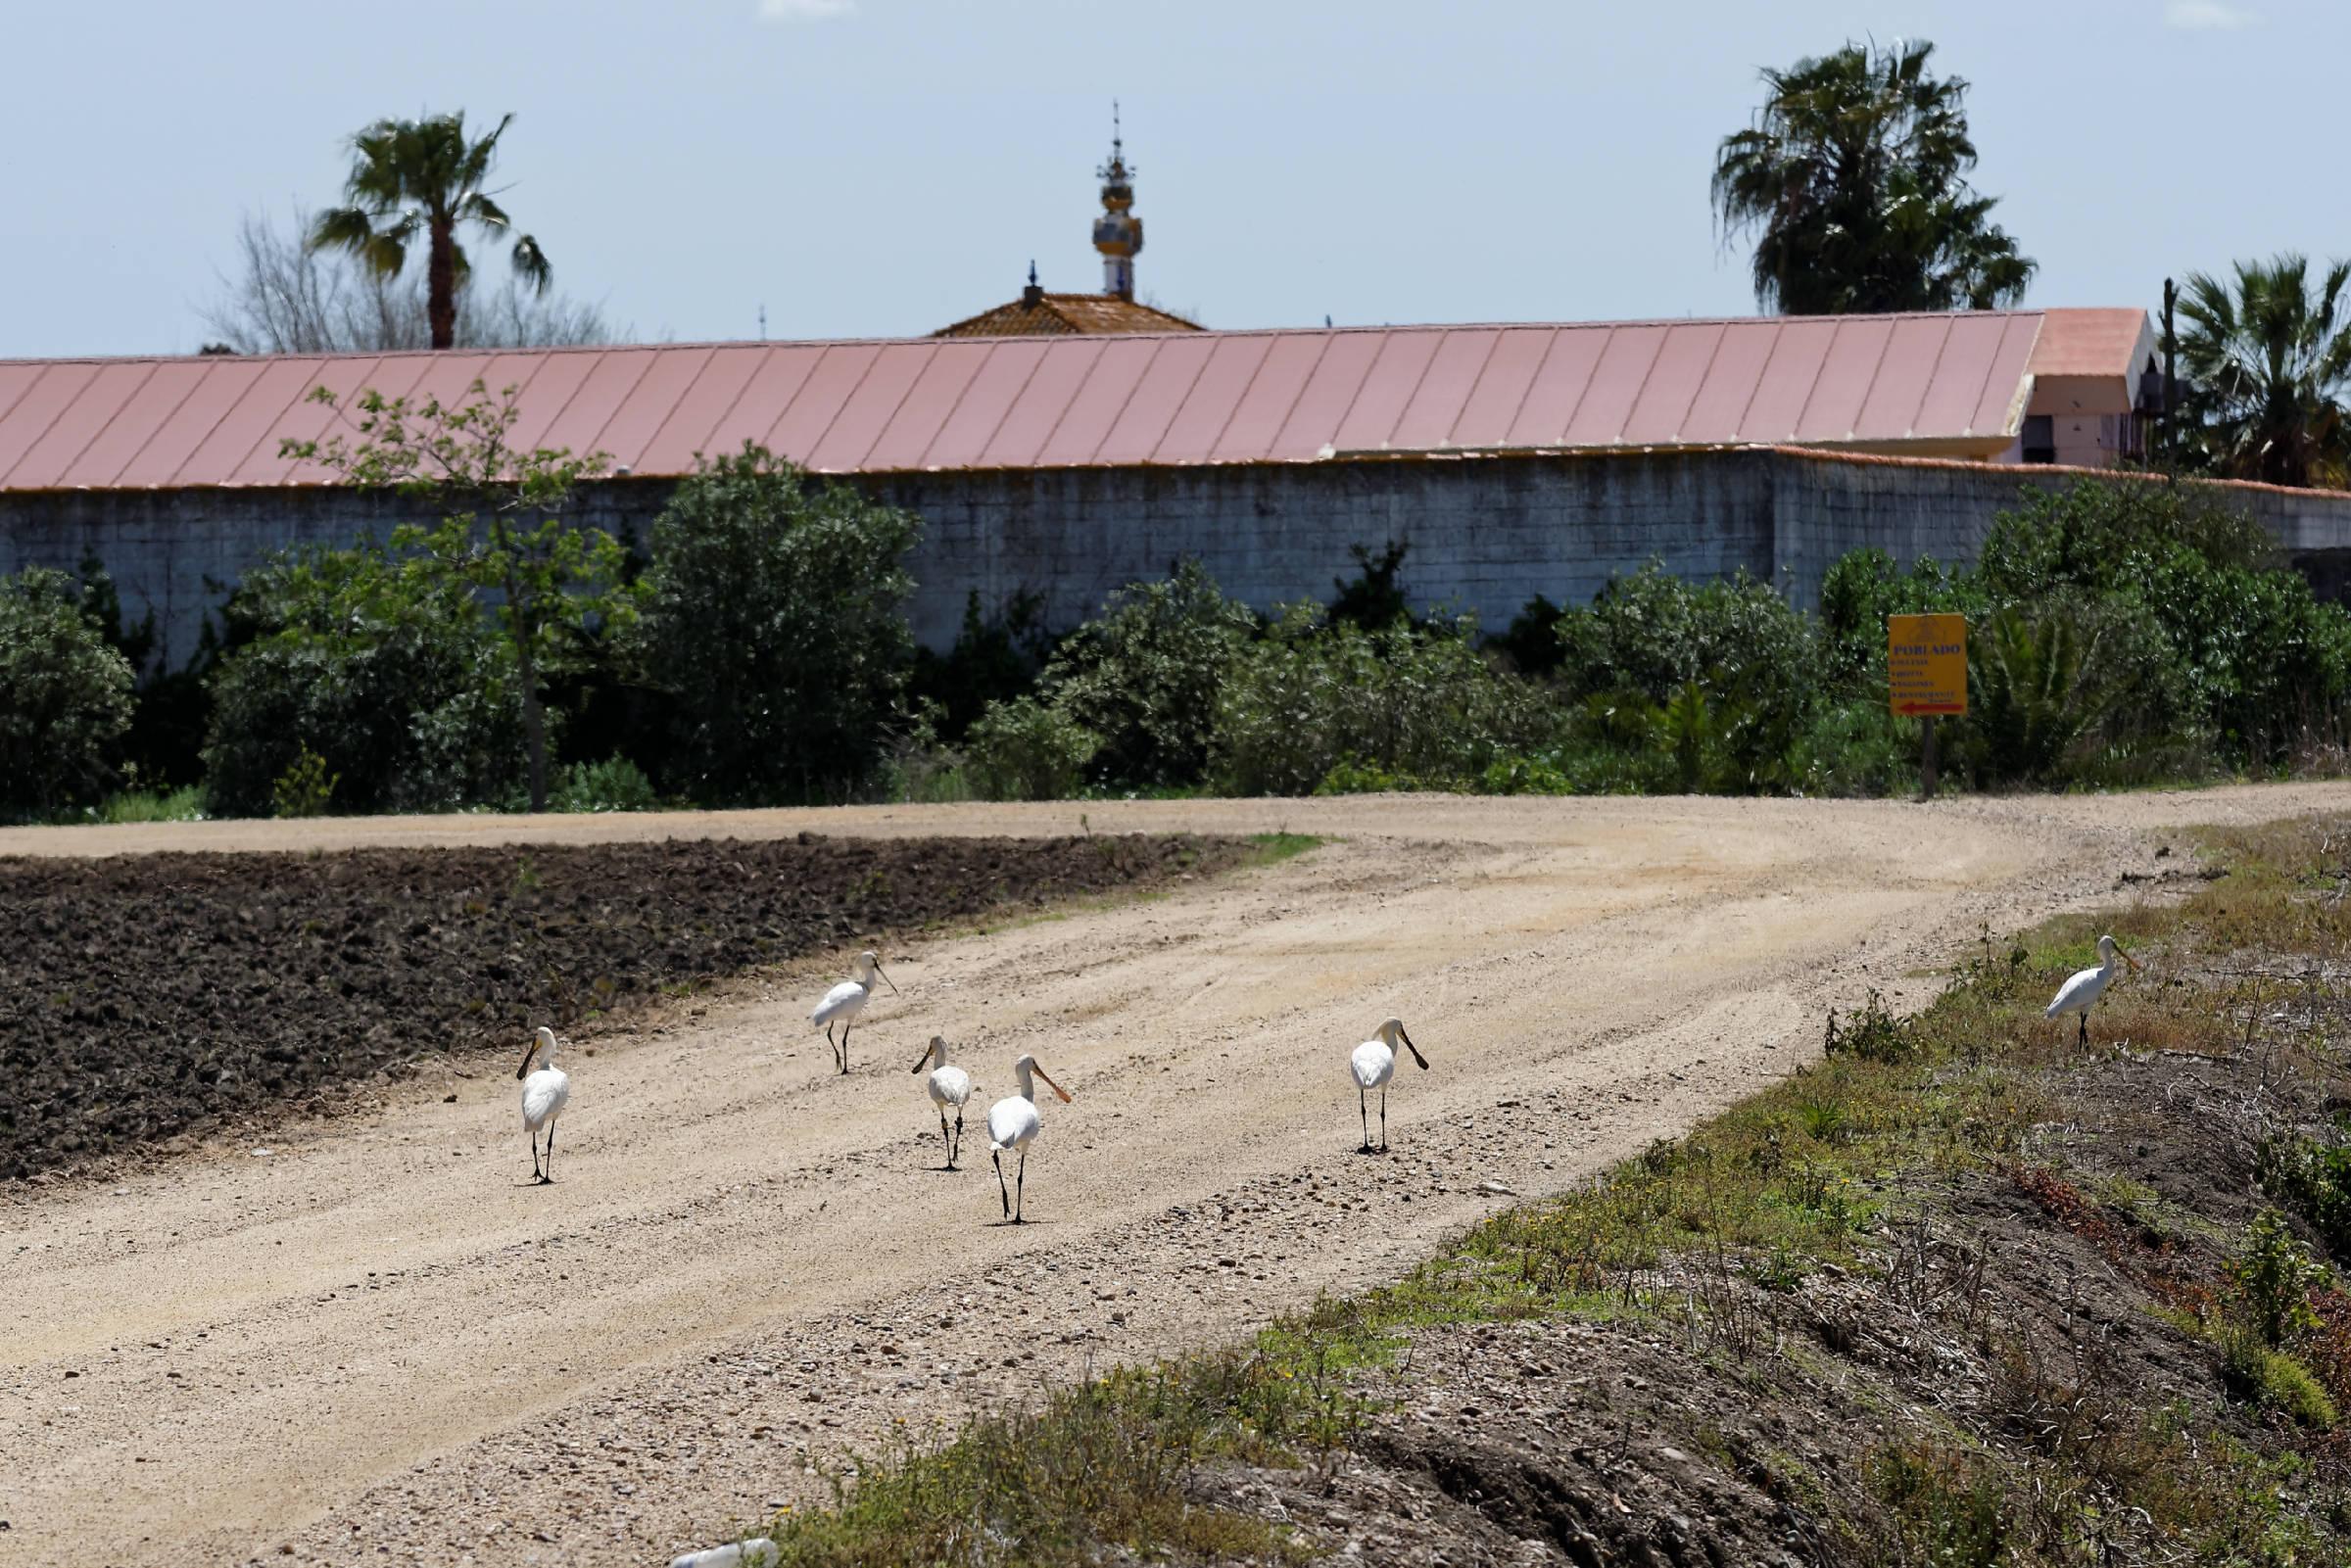 160414-Isla minima - Escobar (Andalousie) (32)